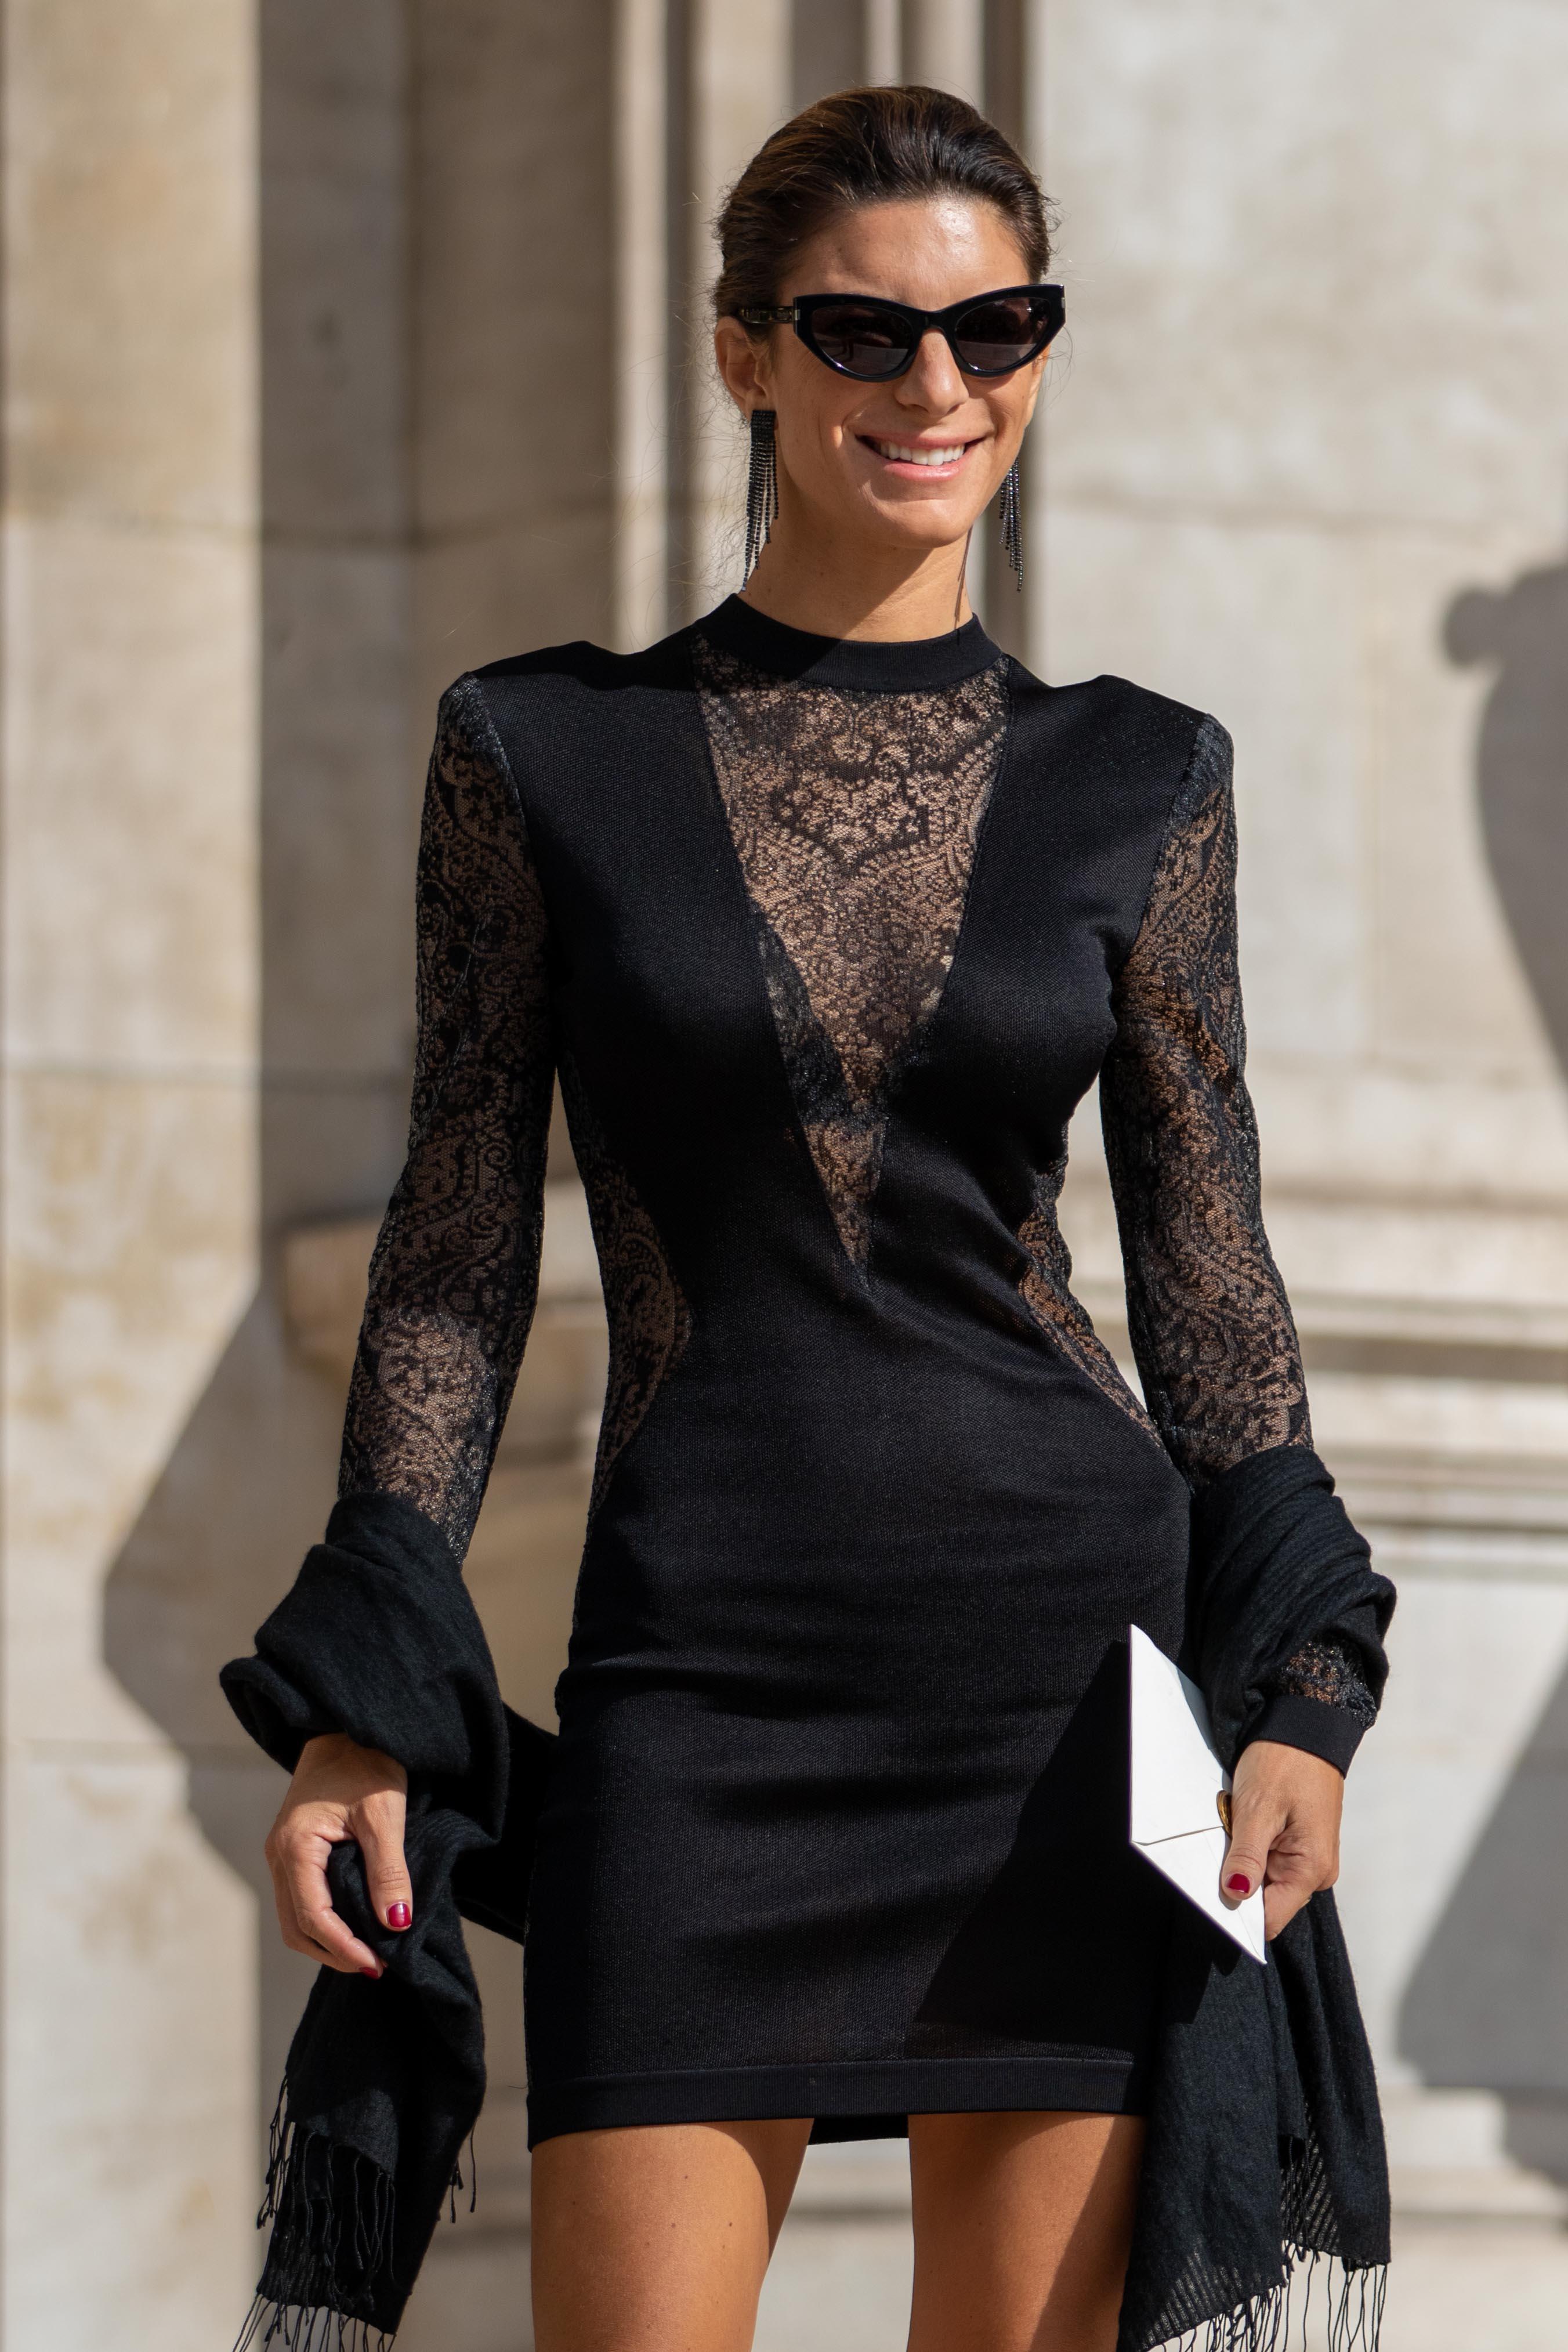 Paris Fashion Week Balmain SS20 Street Style